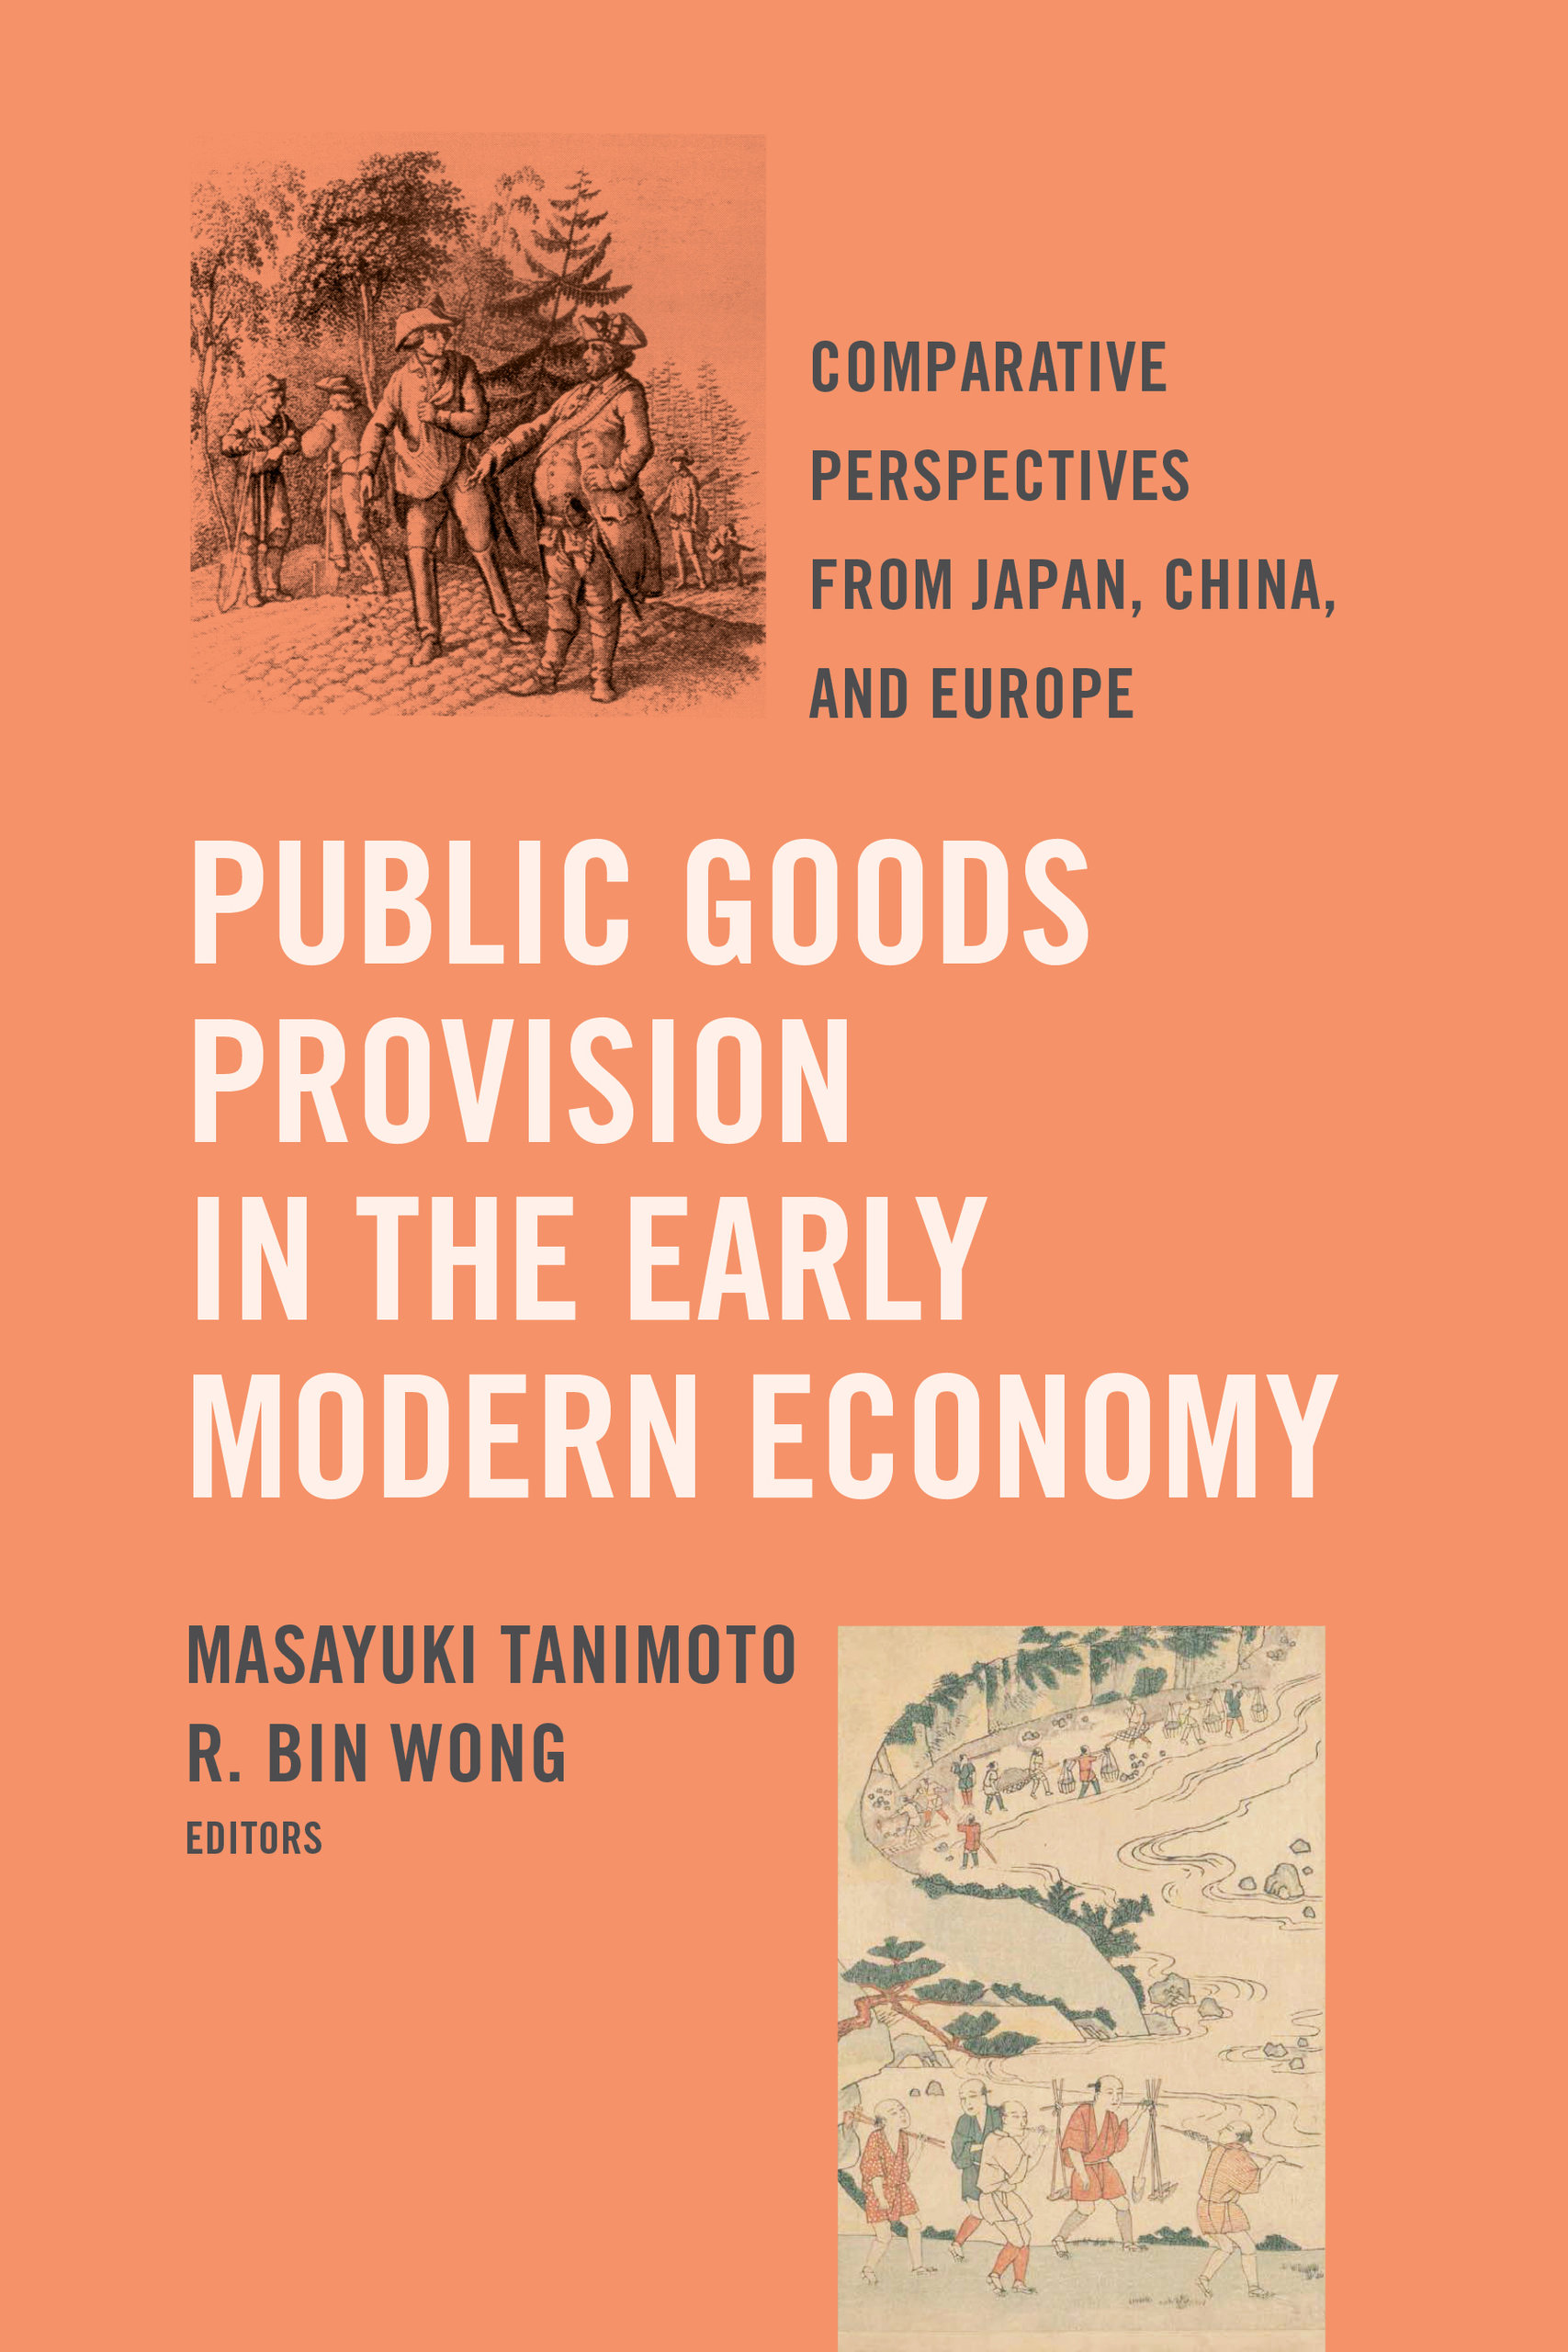 Public Goods Provision In The Early Modern Economy By Masayuki Tanimoto R Bin Wong Paperback University Of California Press